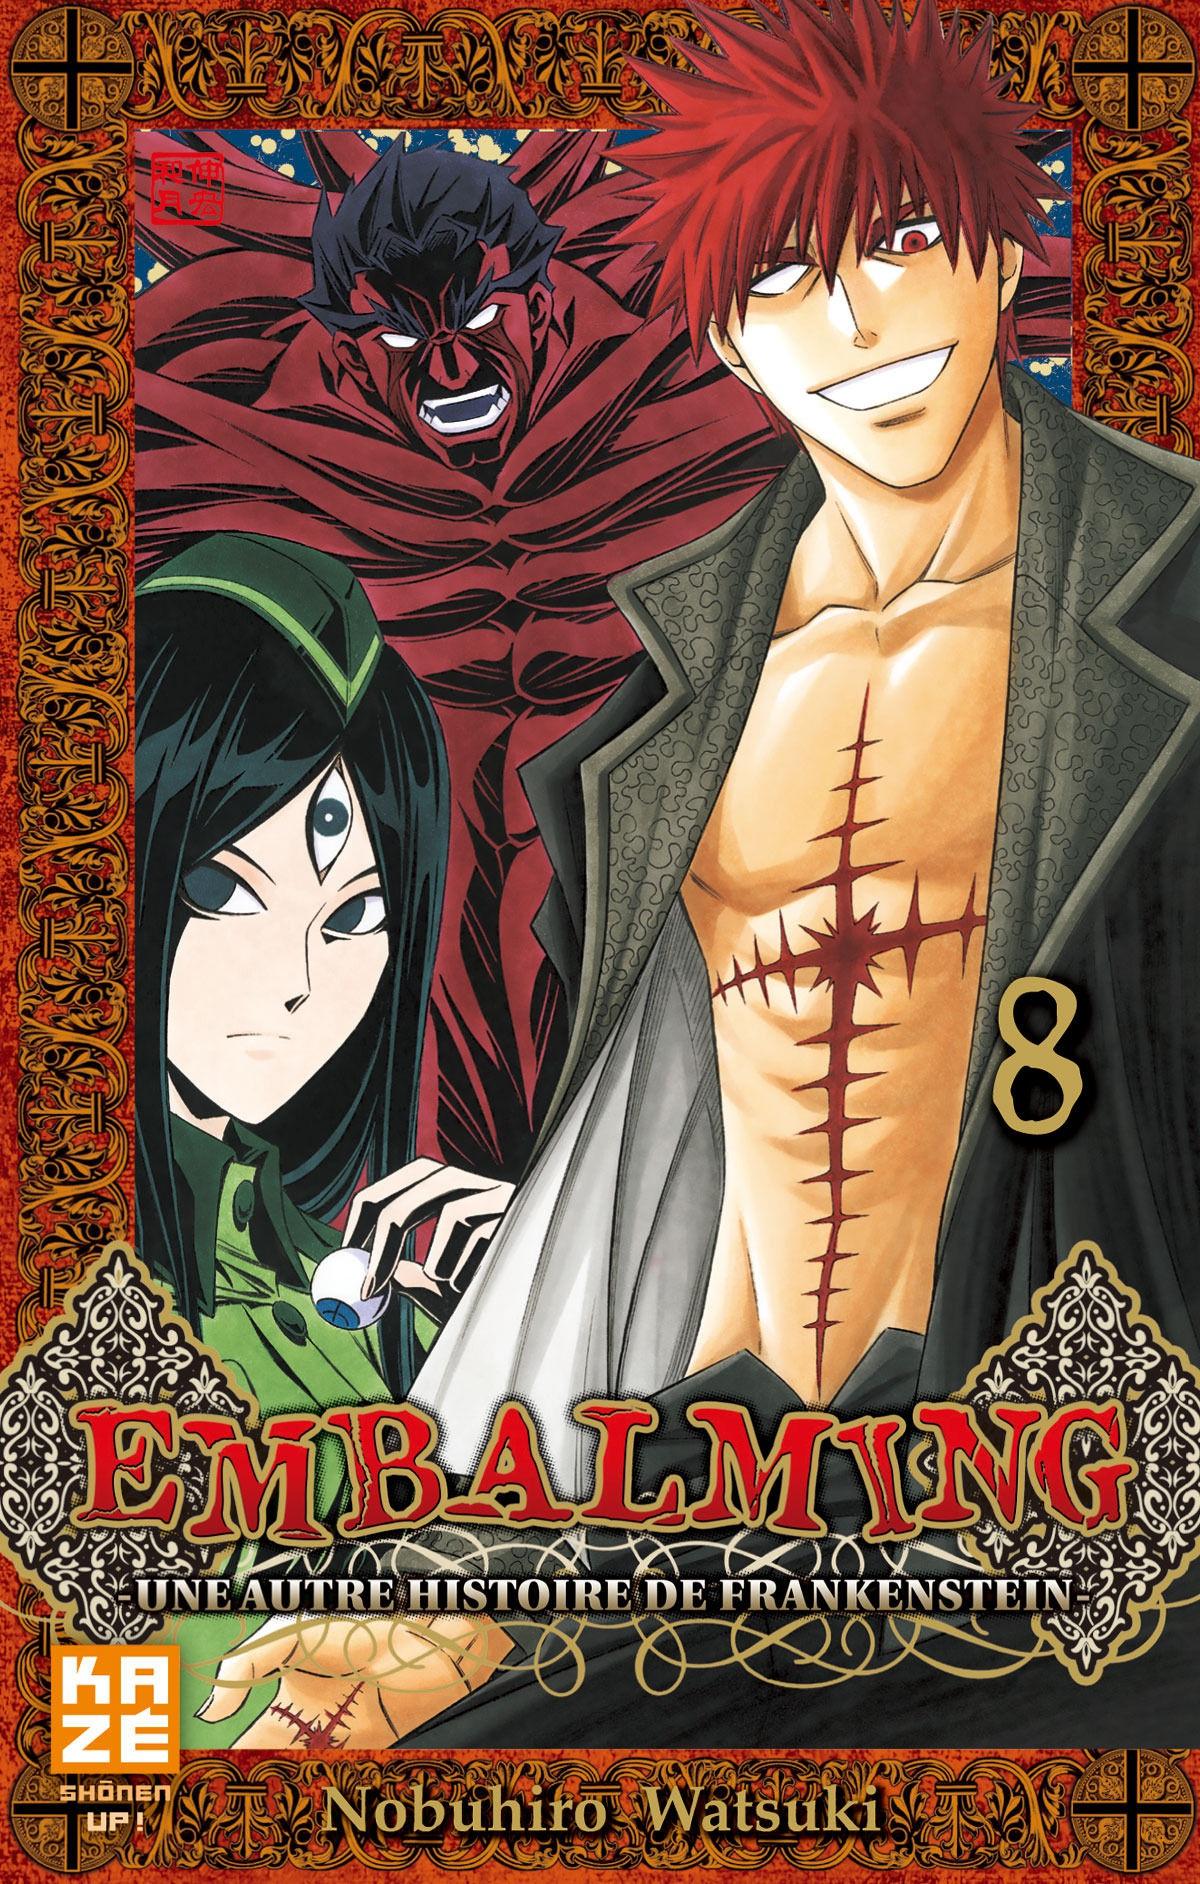 https://nine.mangadogs.com/fr_manga/pic1/10/1354/53859/EmbalmingUneAutreHistoireD_0_557.jpg Page 1